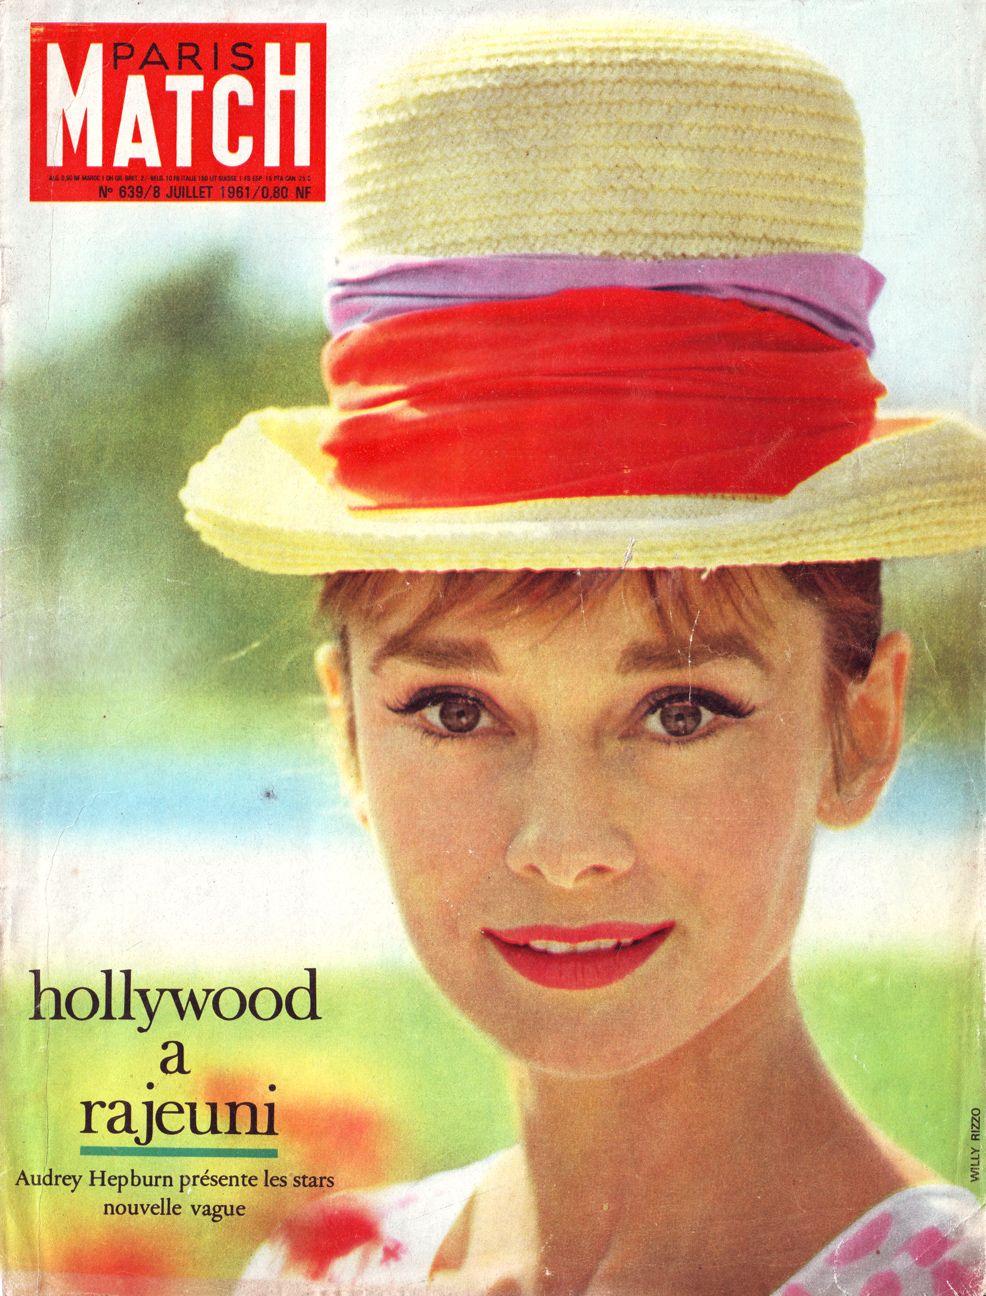 Audrey Hepburn in Paris Match